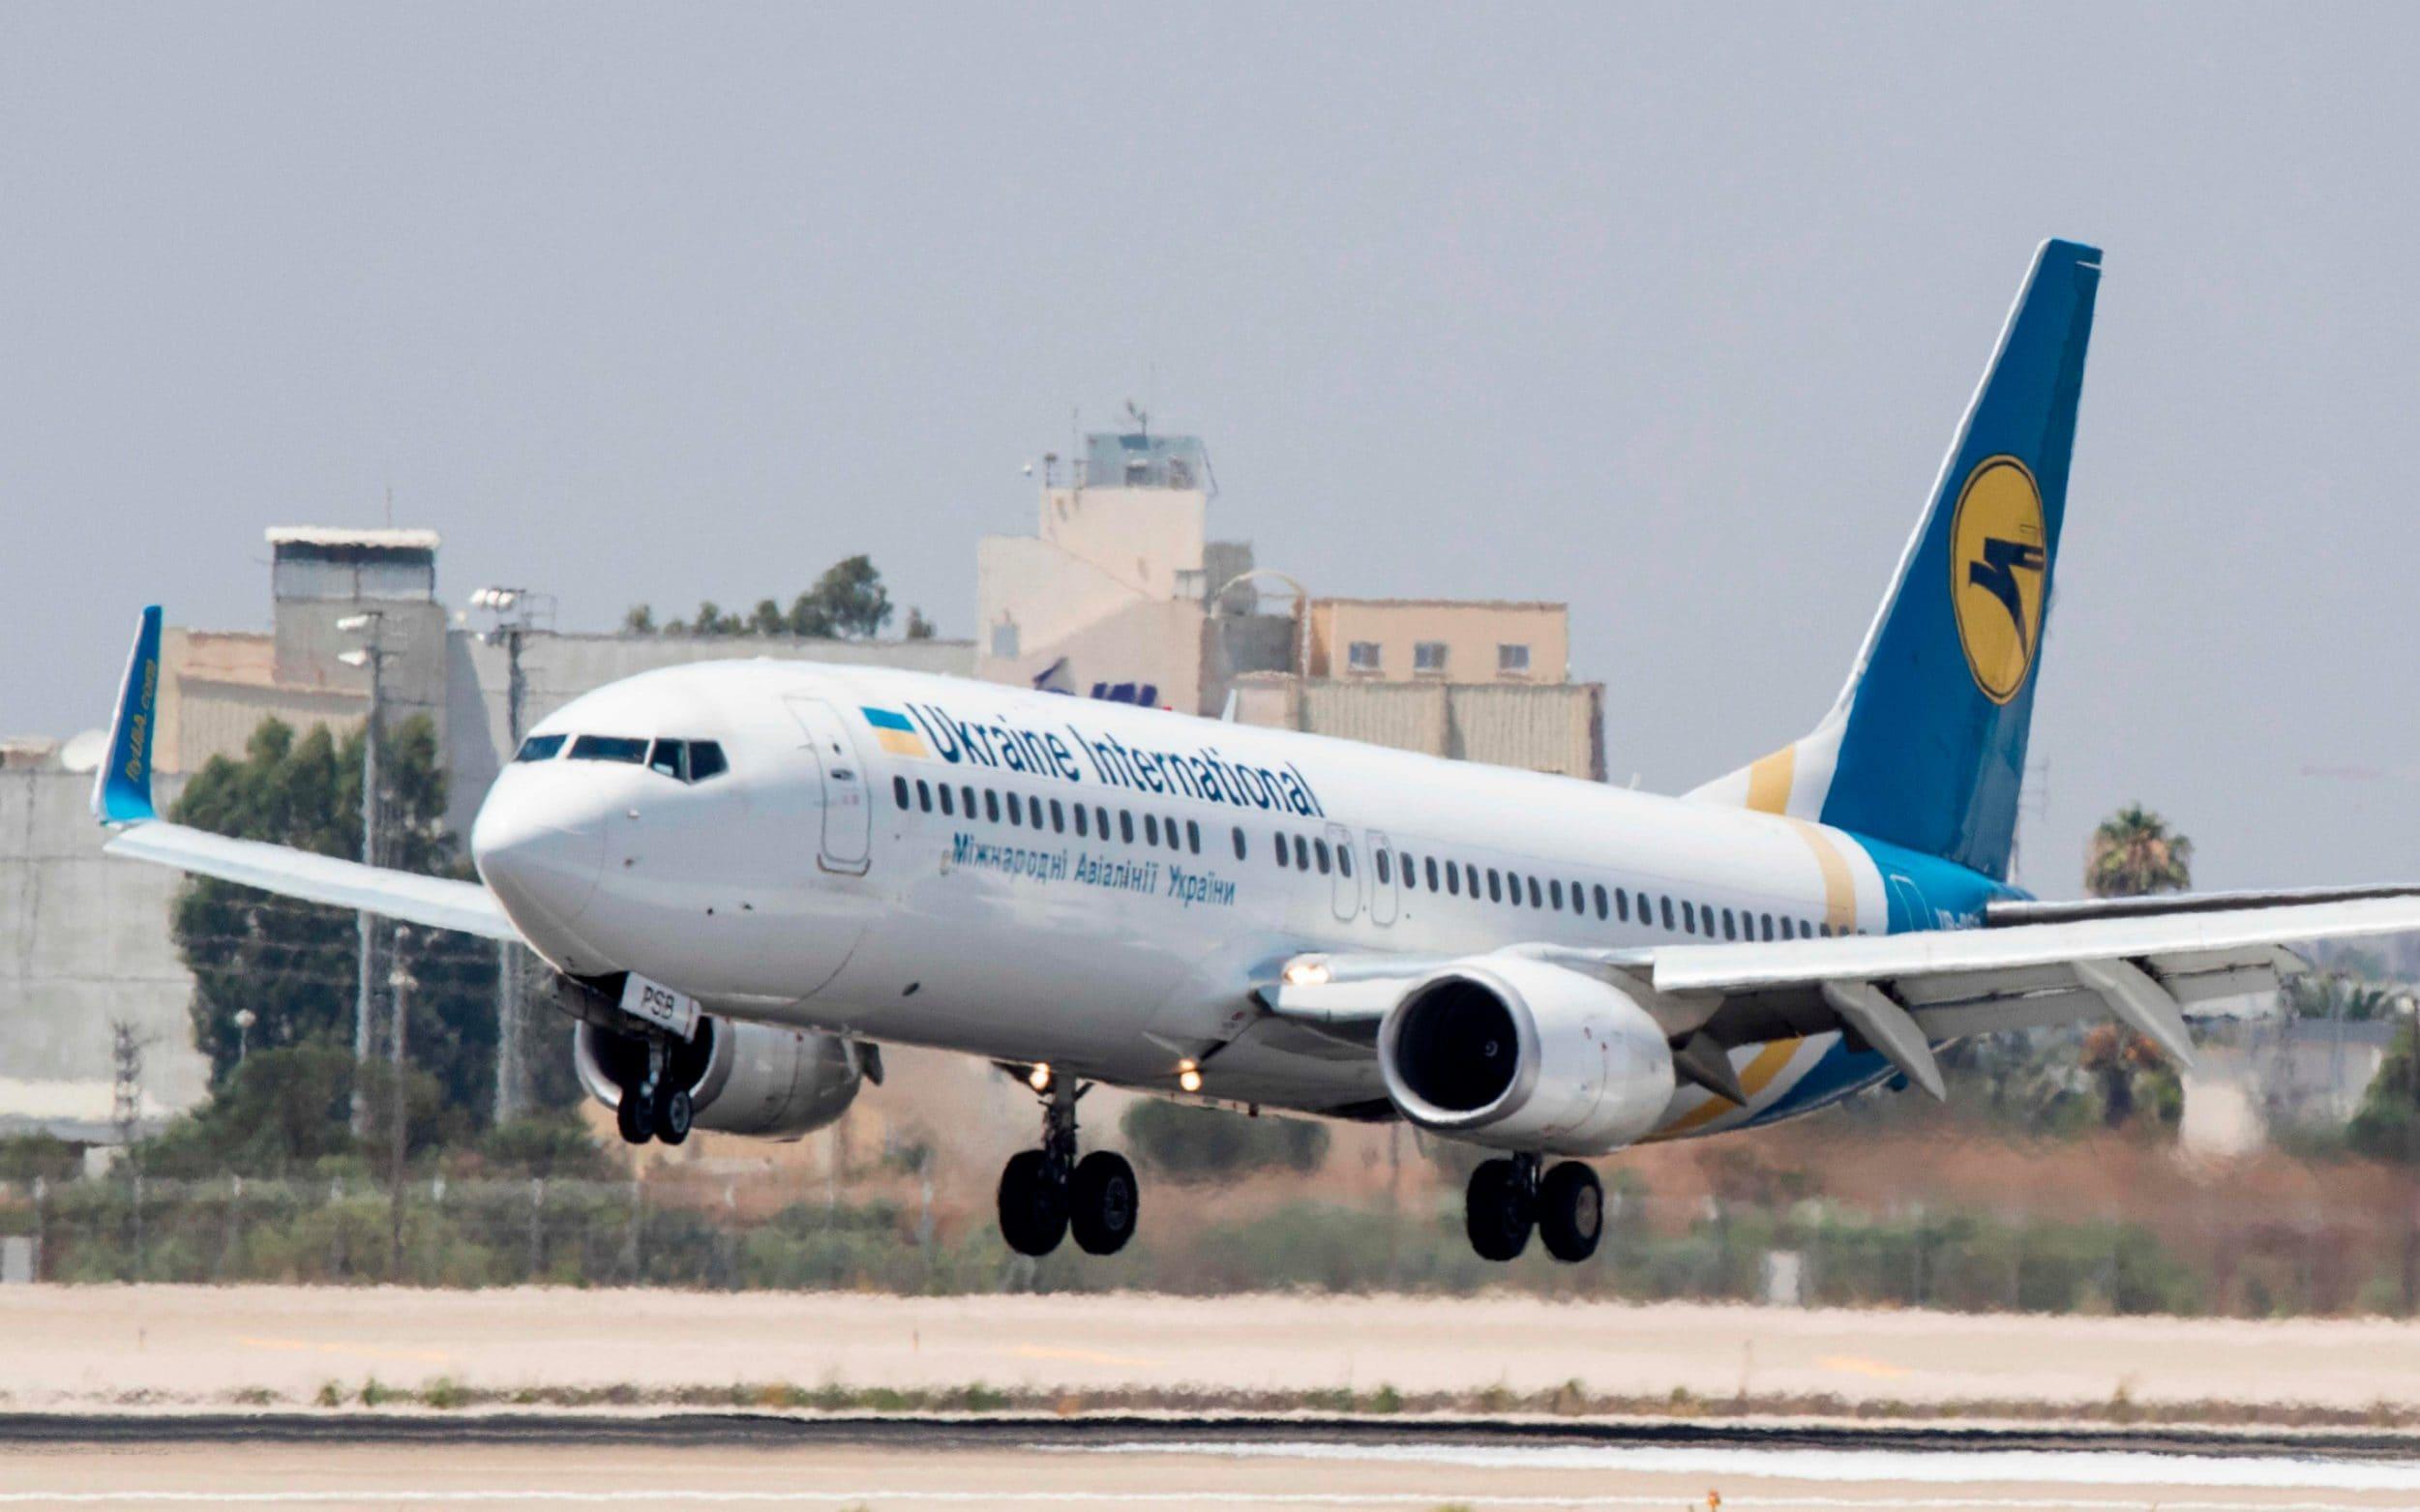 Iran plane crash: Ukraine Boeing 737 carrying 180 people crashes near Tehran